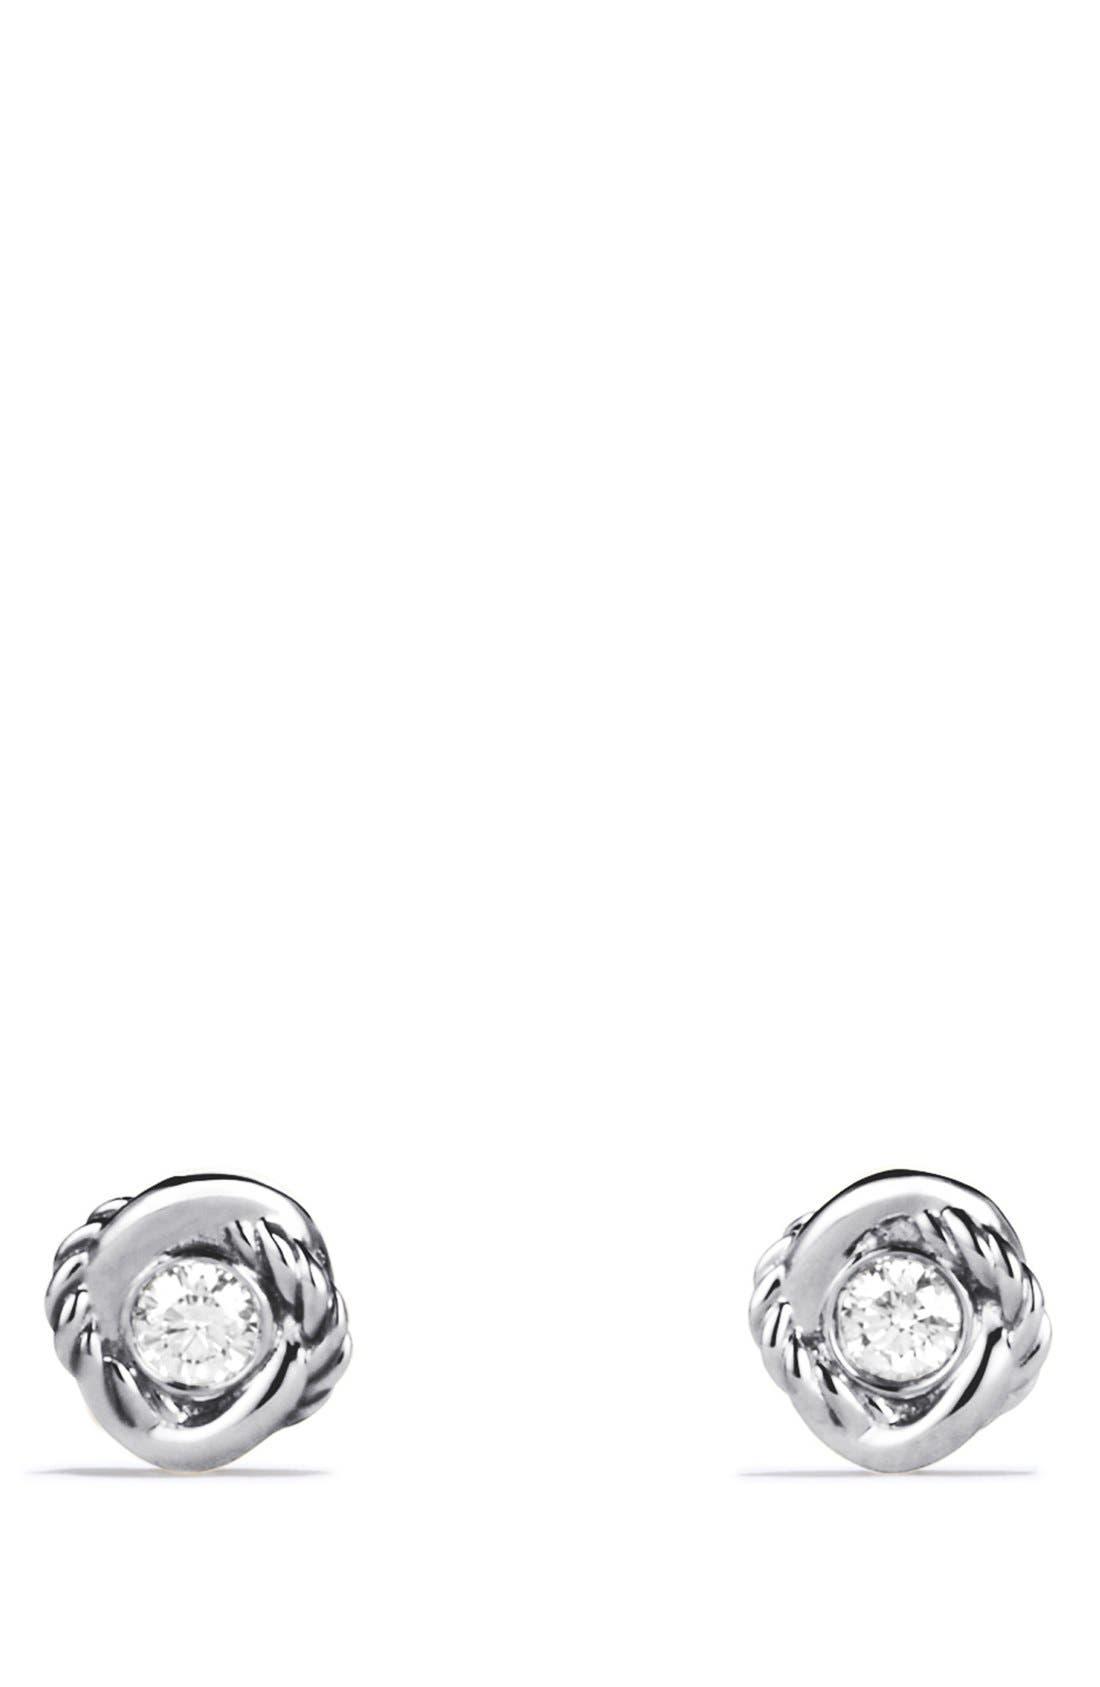 'Infinity' Earrings with Diamonds,                             Alternate thumbnail 2, color,                             DIAMOND